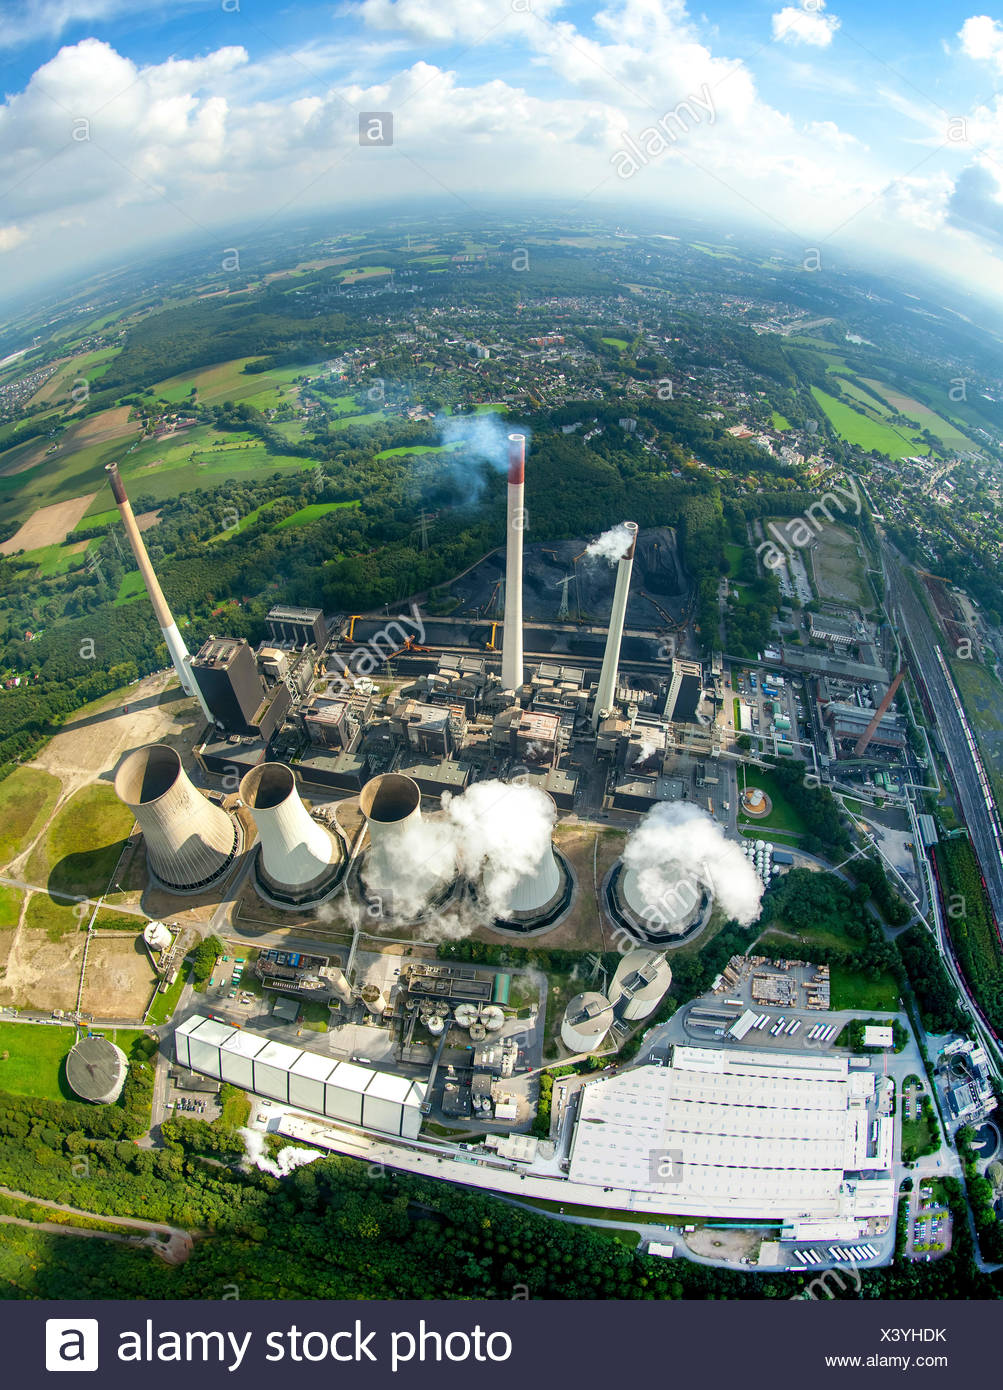 E.ON Scholven Power Station, Gelsenkirchen, Ruhr district, North Rhine-Westphalia, Germany - Stock Image